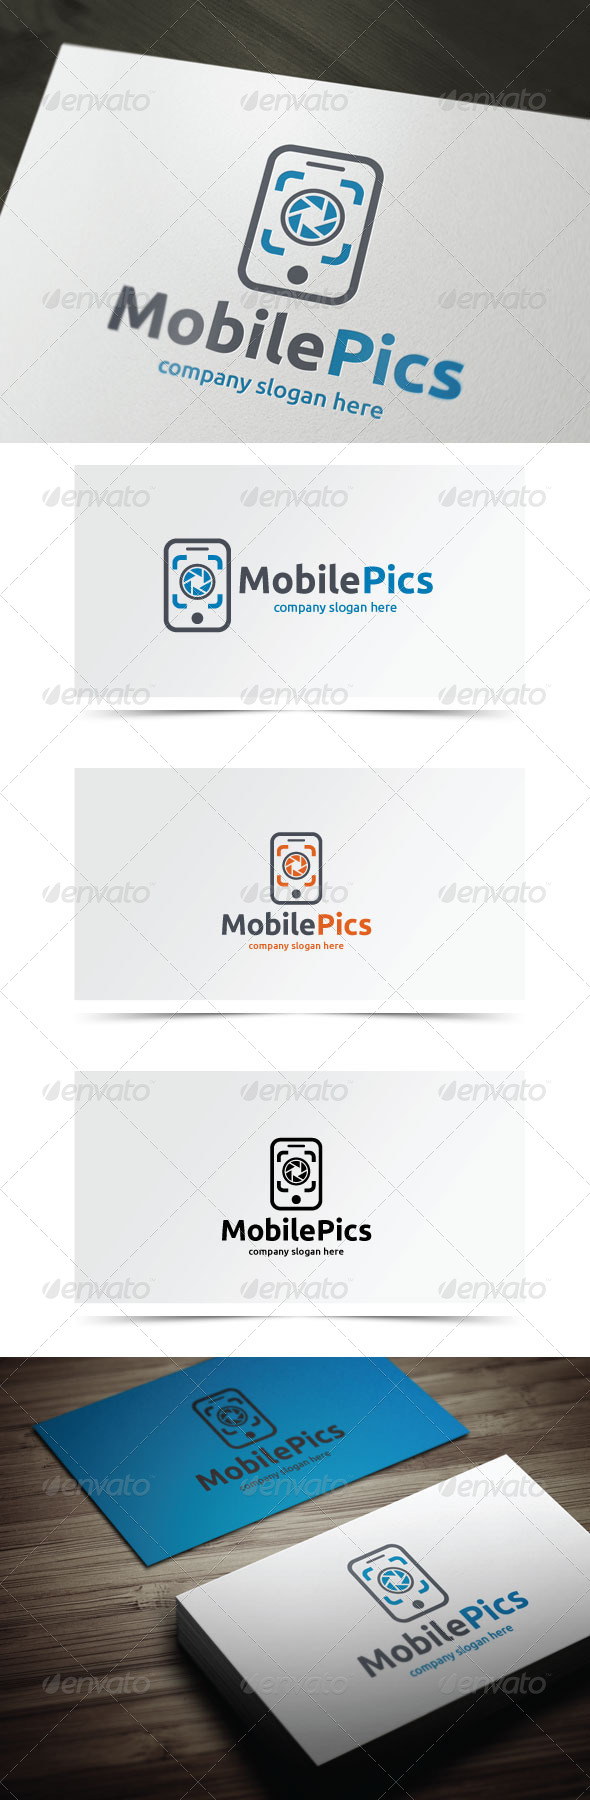 Mobile Pics